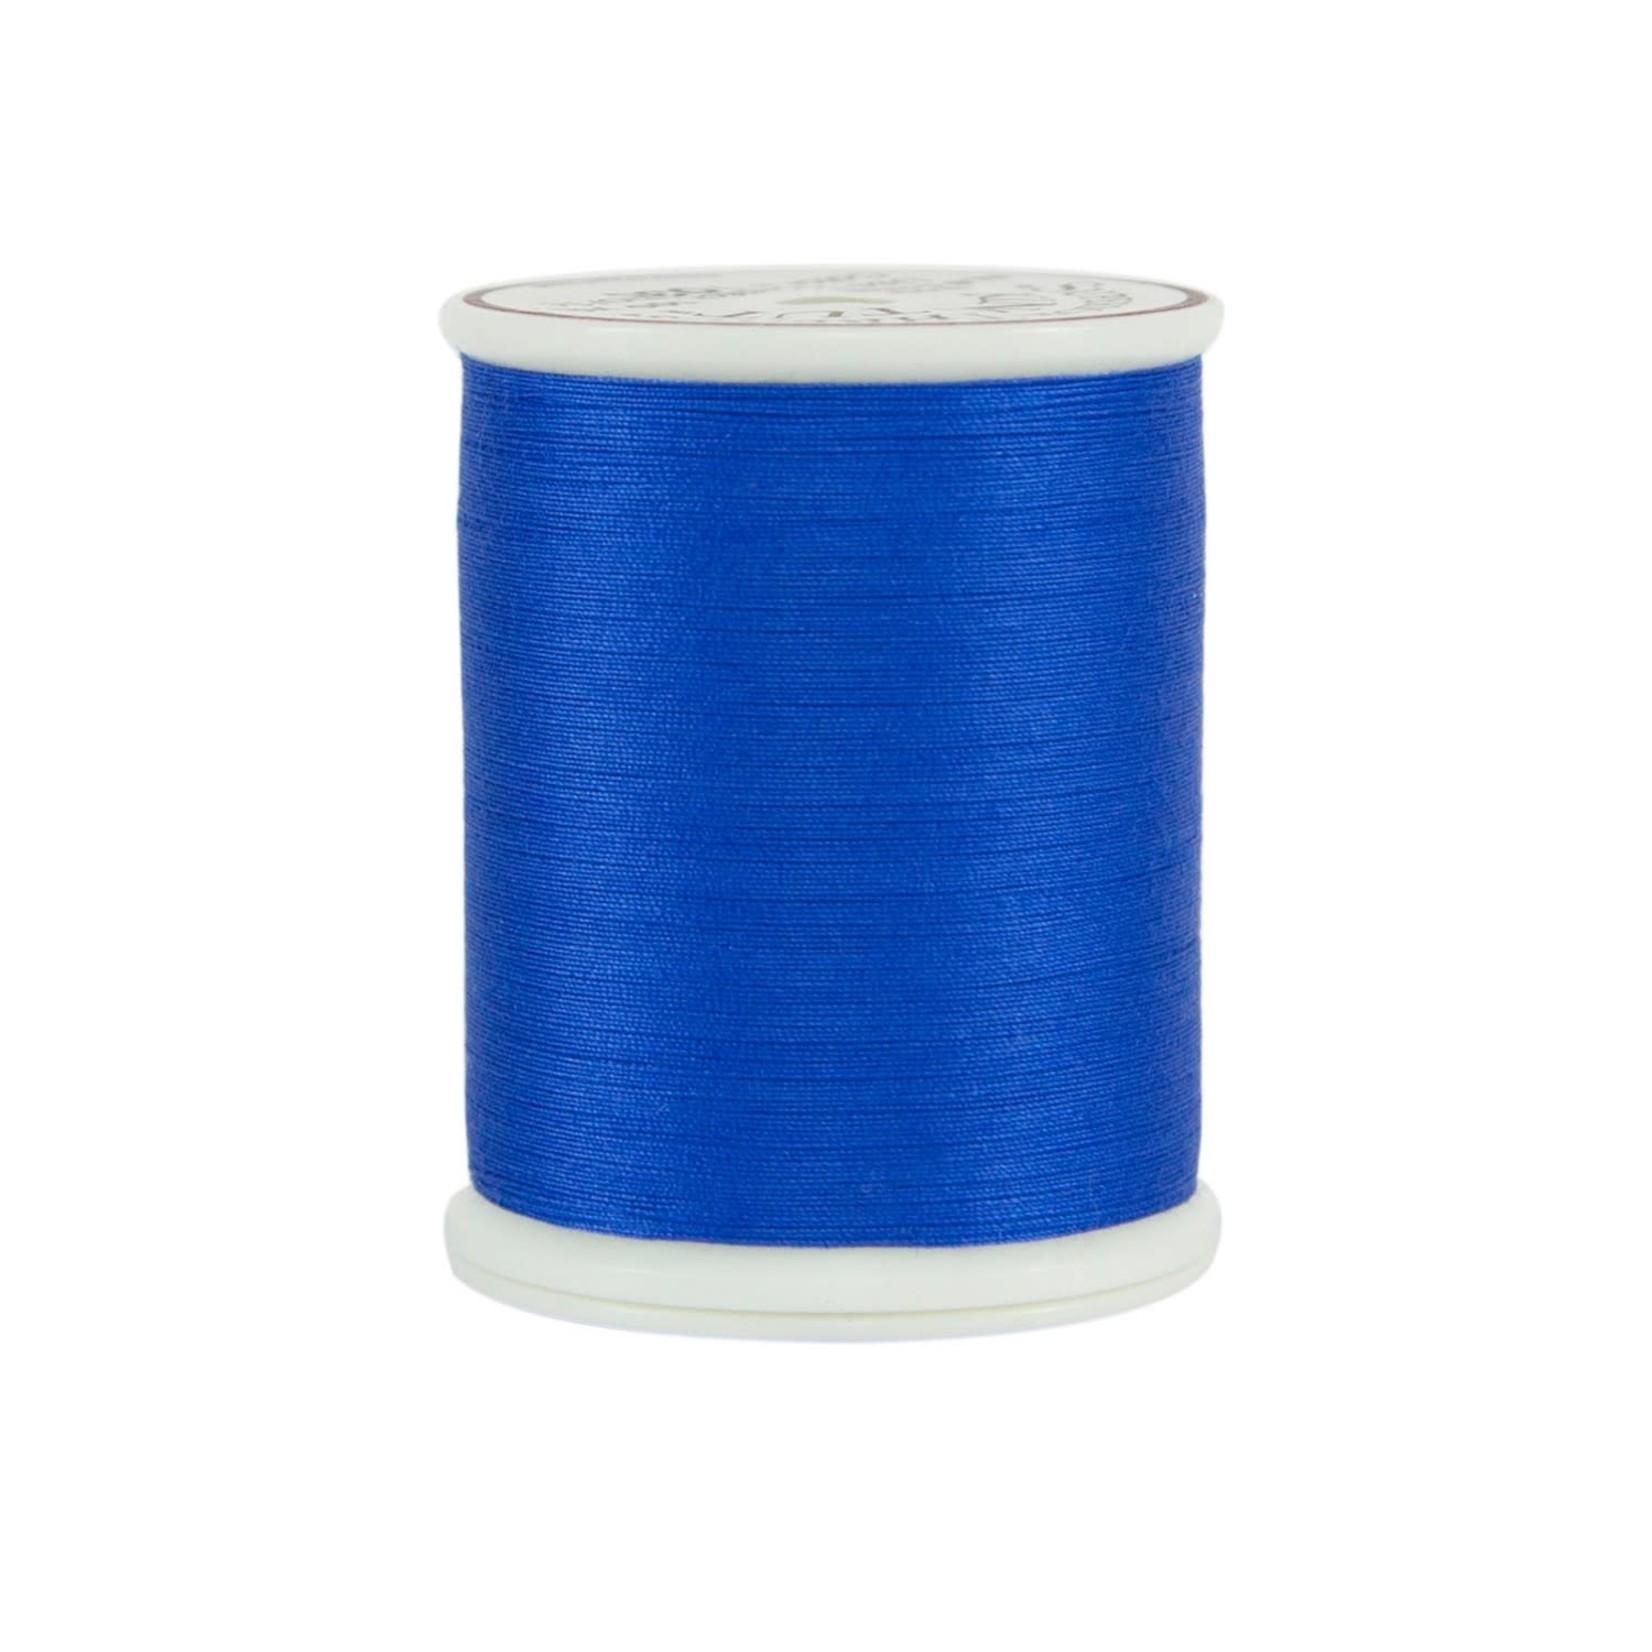 Superior Threads King Tut - #40 - 457 m - 1035 Dark B.B. Blue